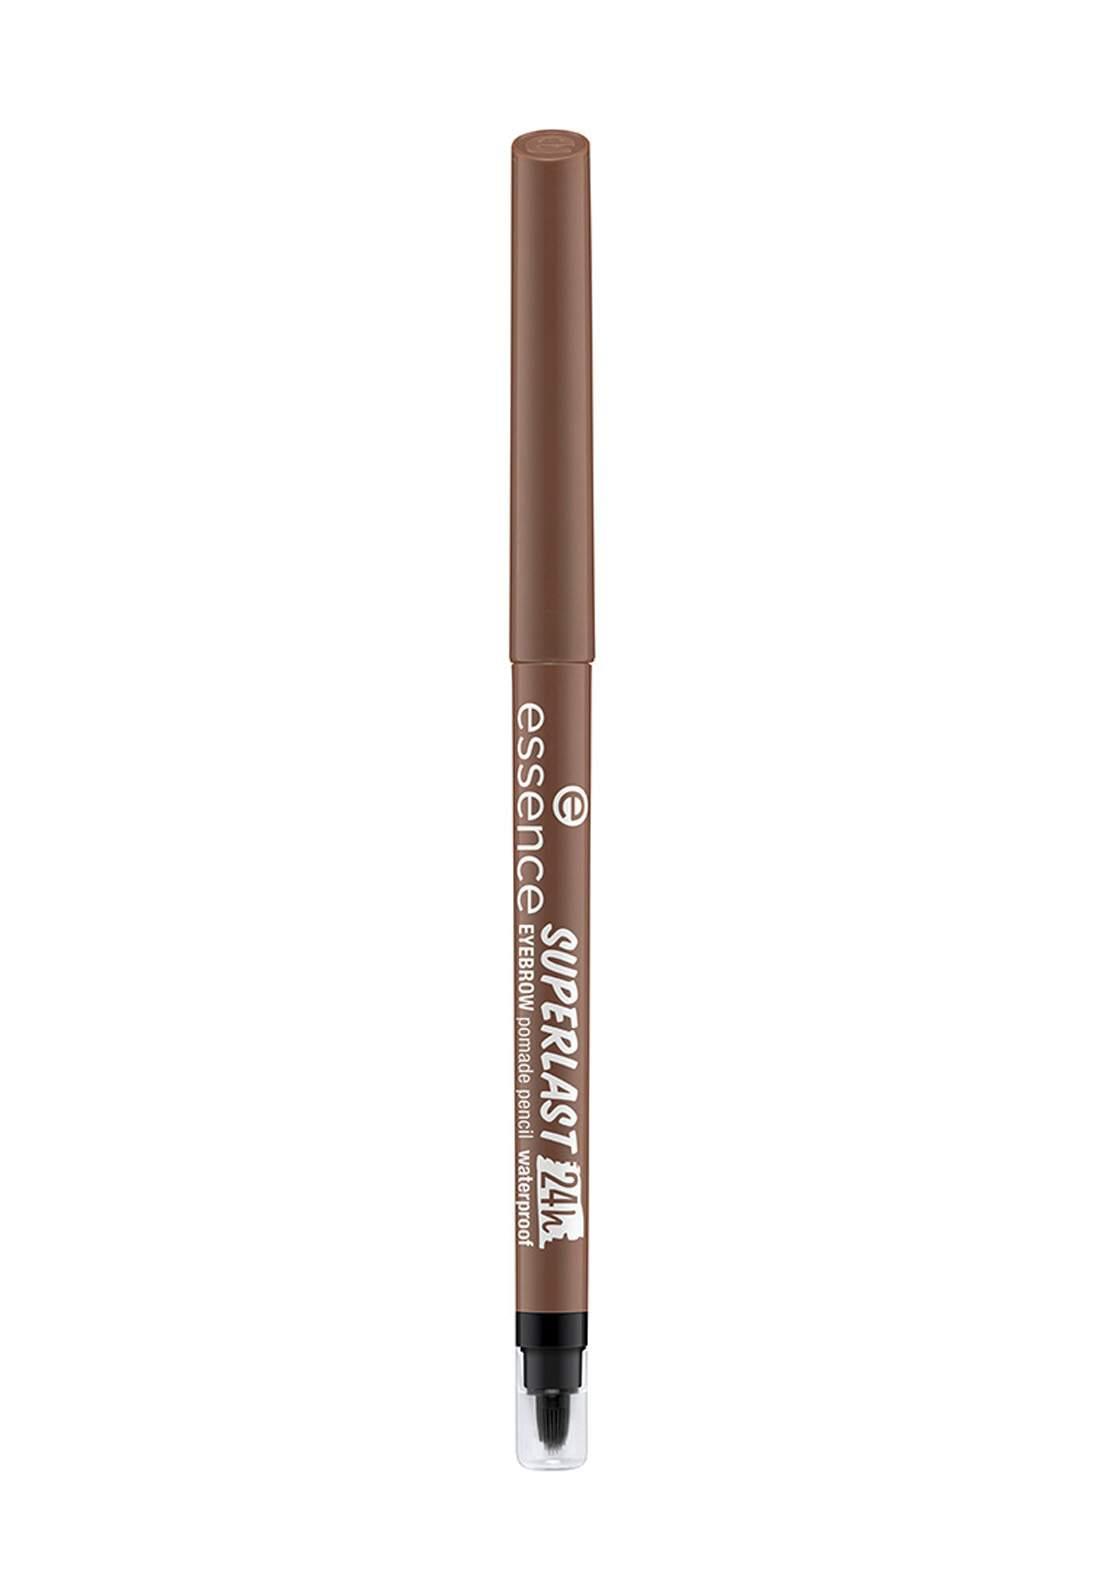 Essence Superlast Eyebrow Pencil Waterproof No.20 Brown قلم تحديد الحاجب